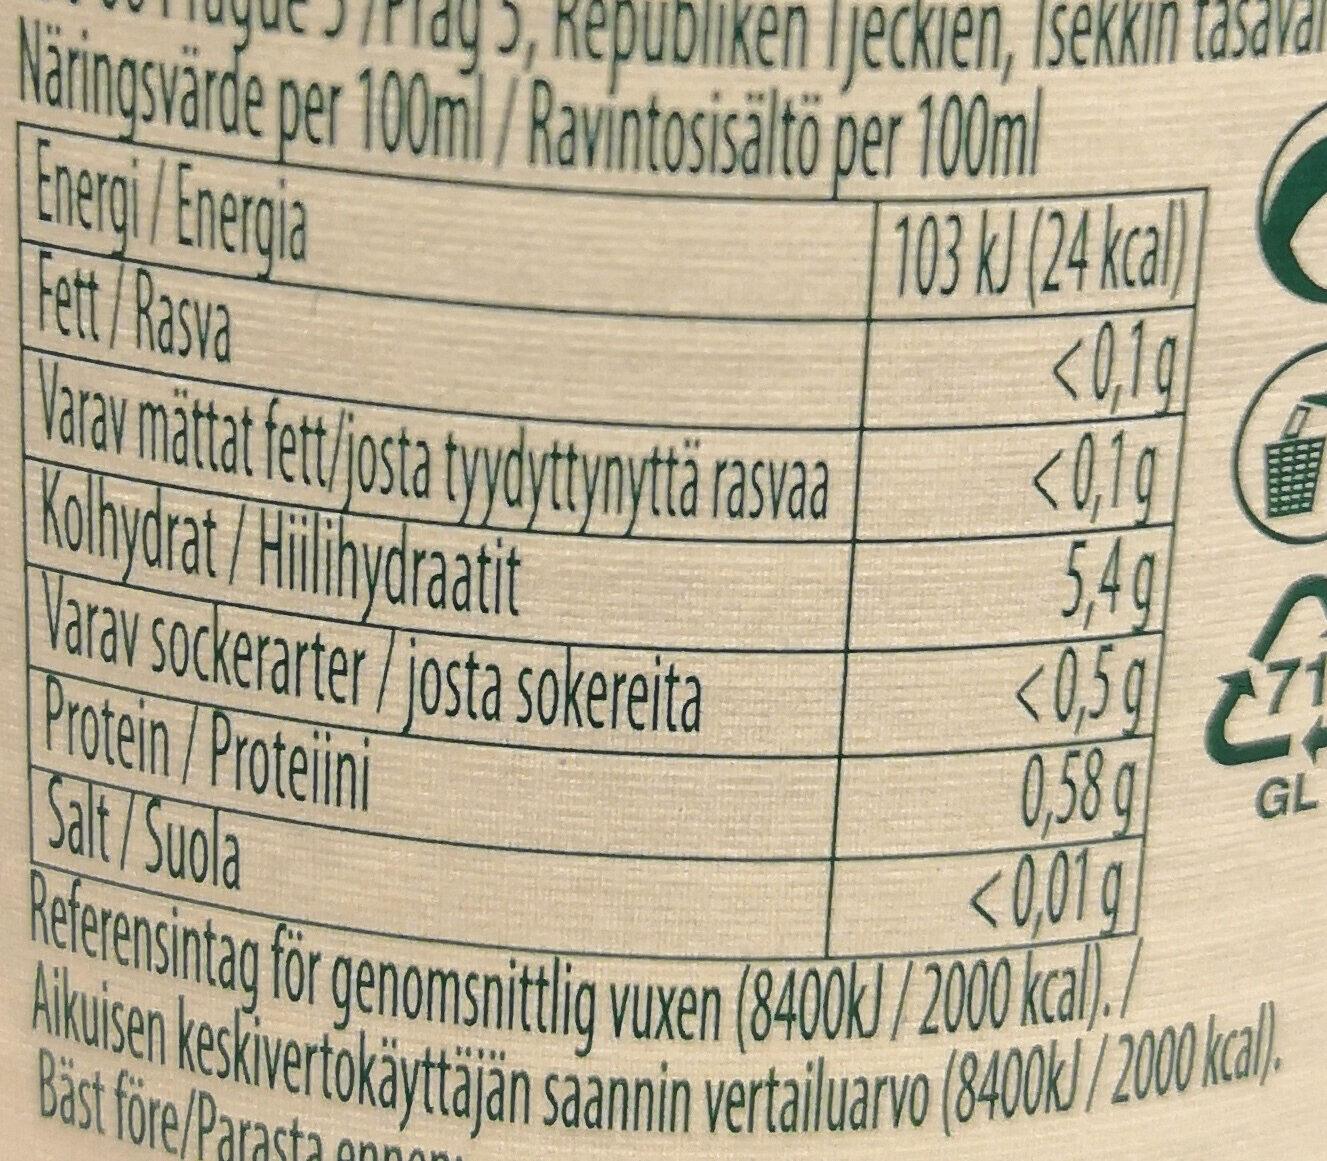 Staropramen non-alcoholic - Nutrition facts - fi